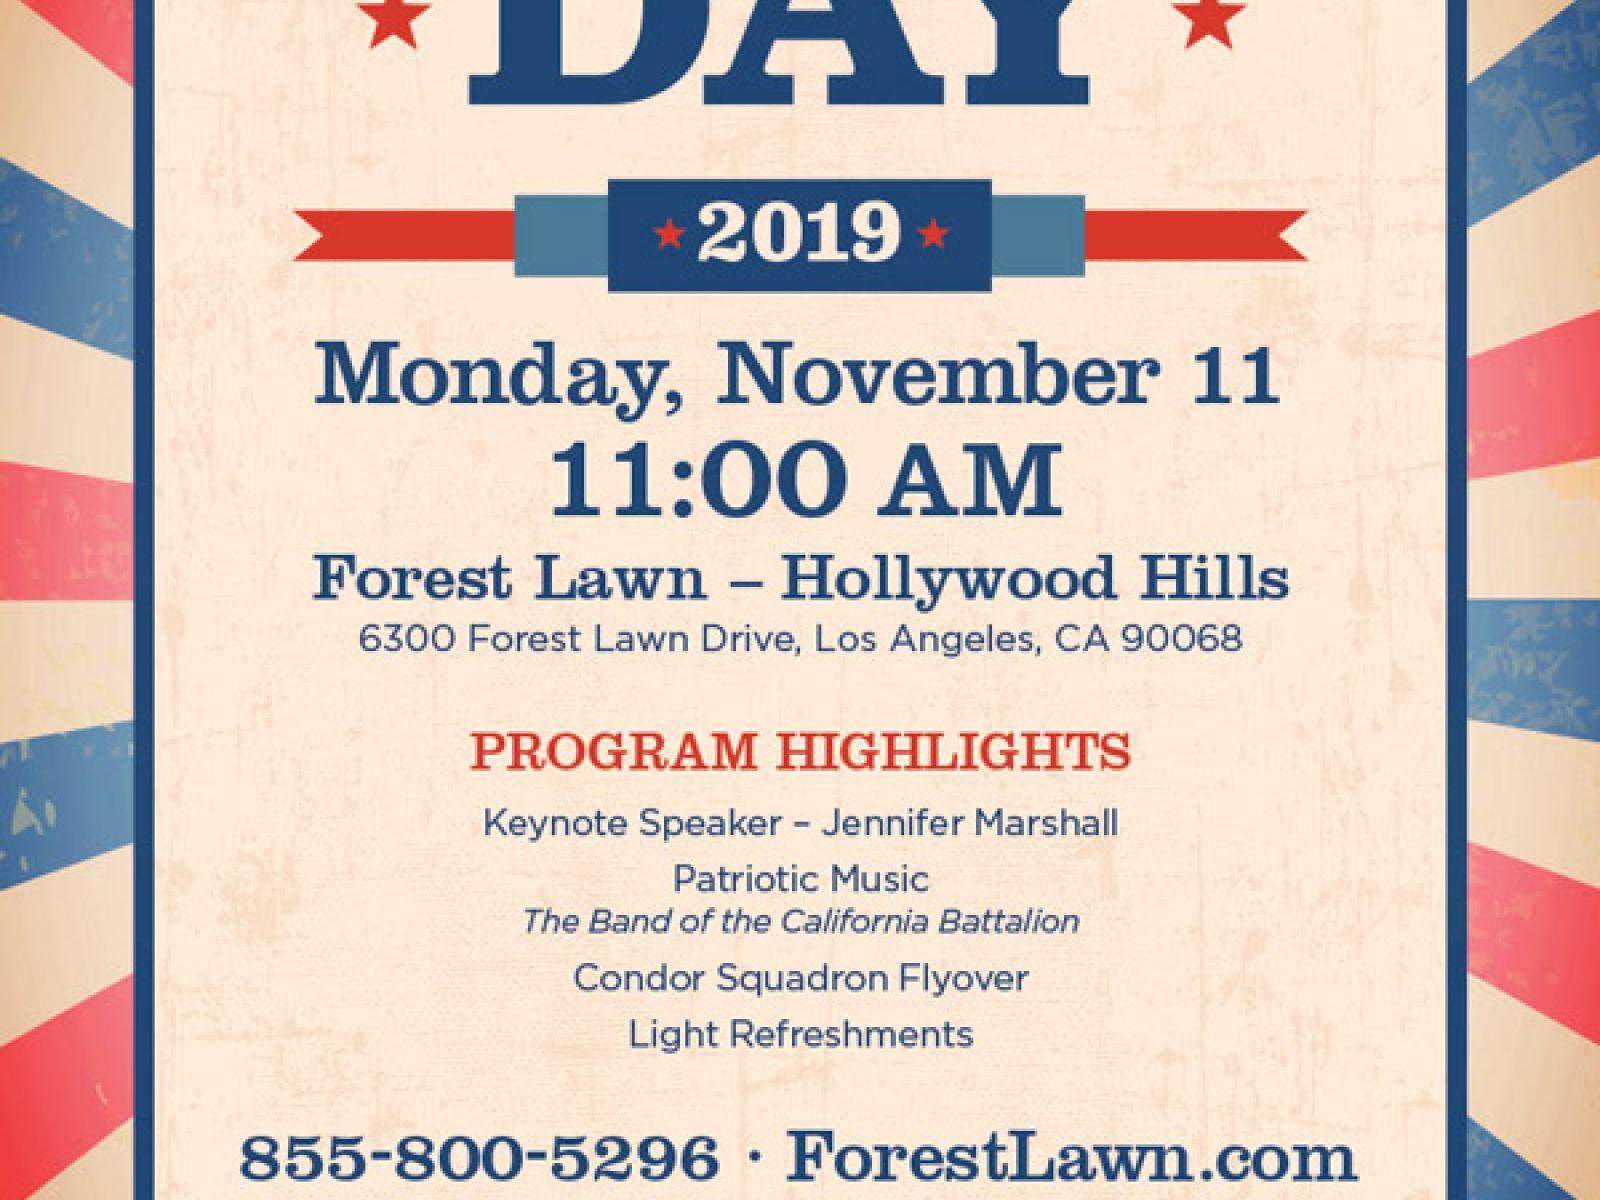 60th annual Veterans Day celebration